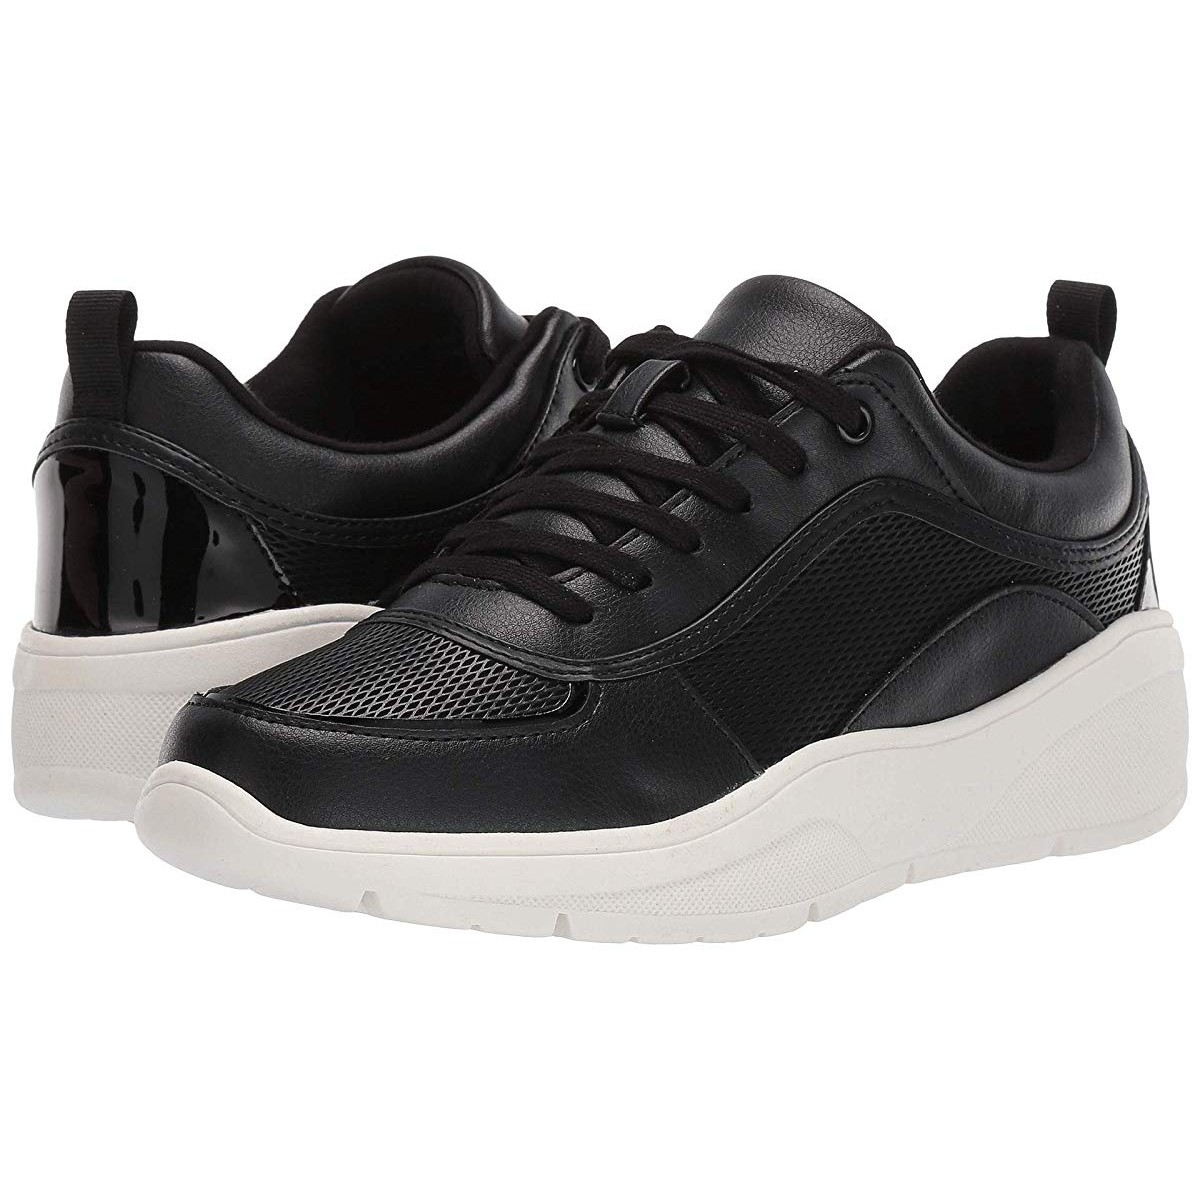 Кроссовки ALDO Eteallan Black Smooth Synthetic - Оригинал, фото 1